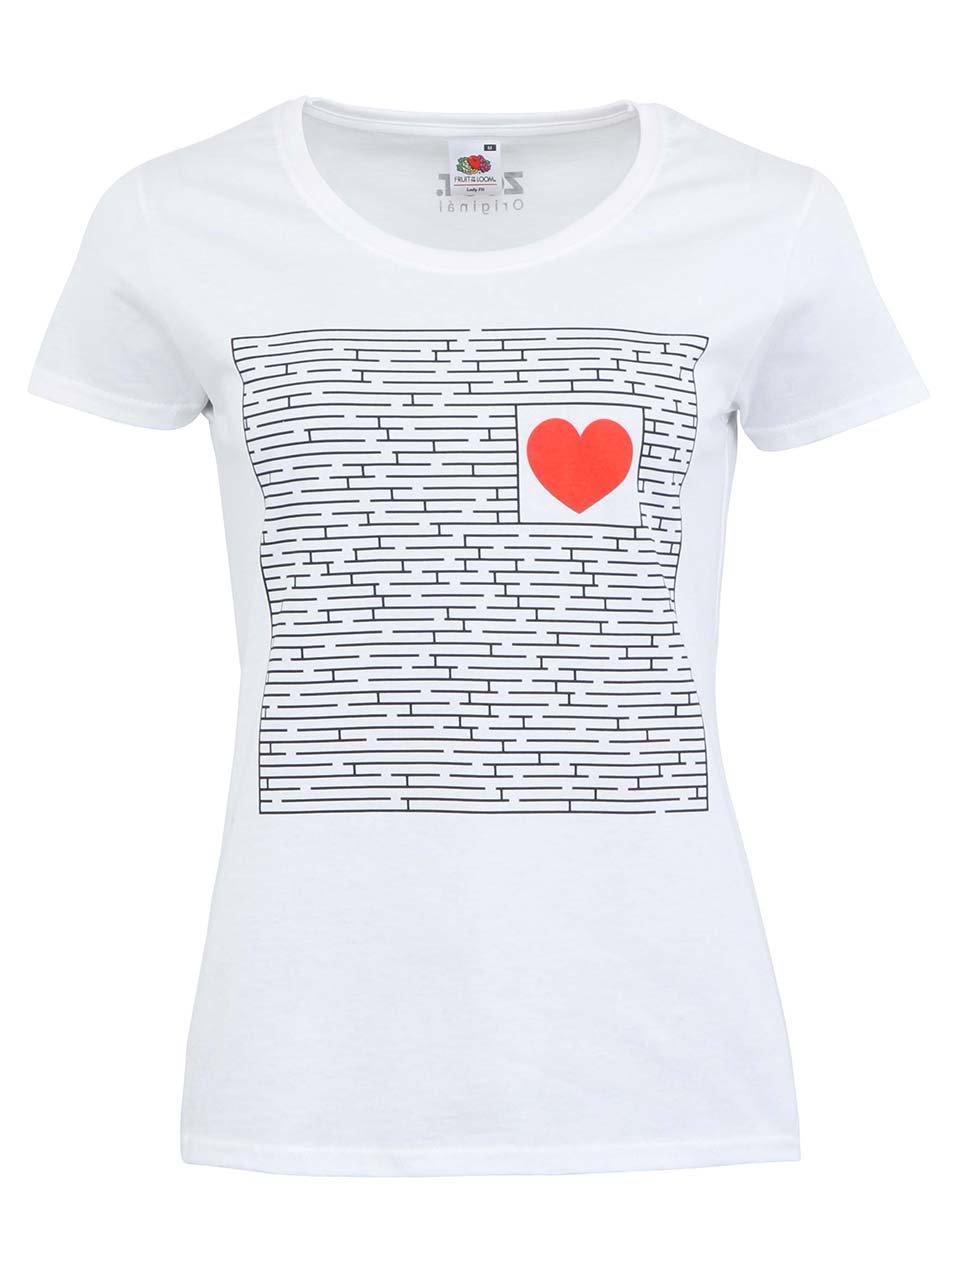 Dámské tričko ZOOT Originál Najdi cestu